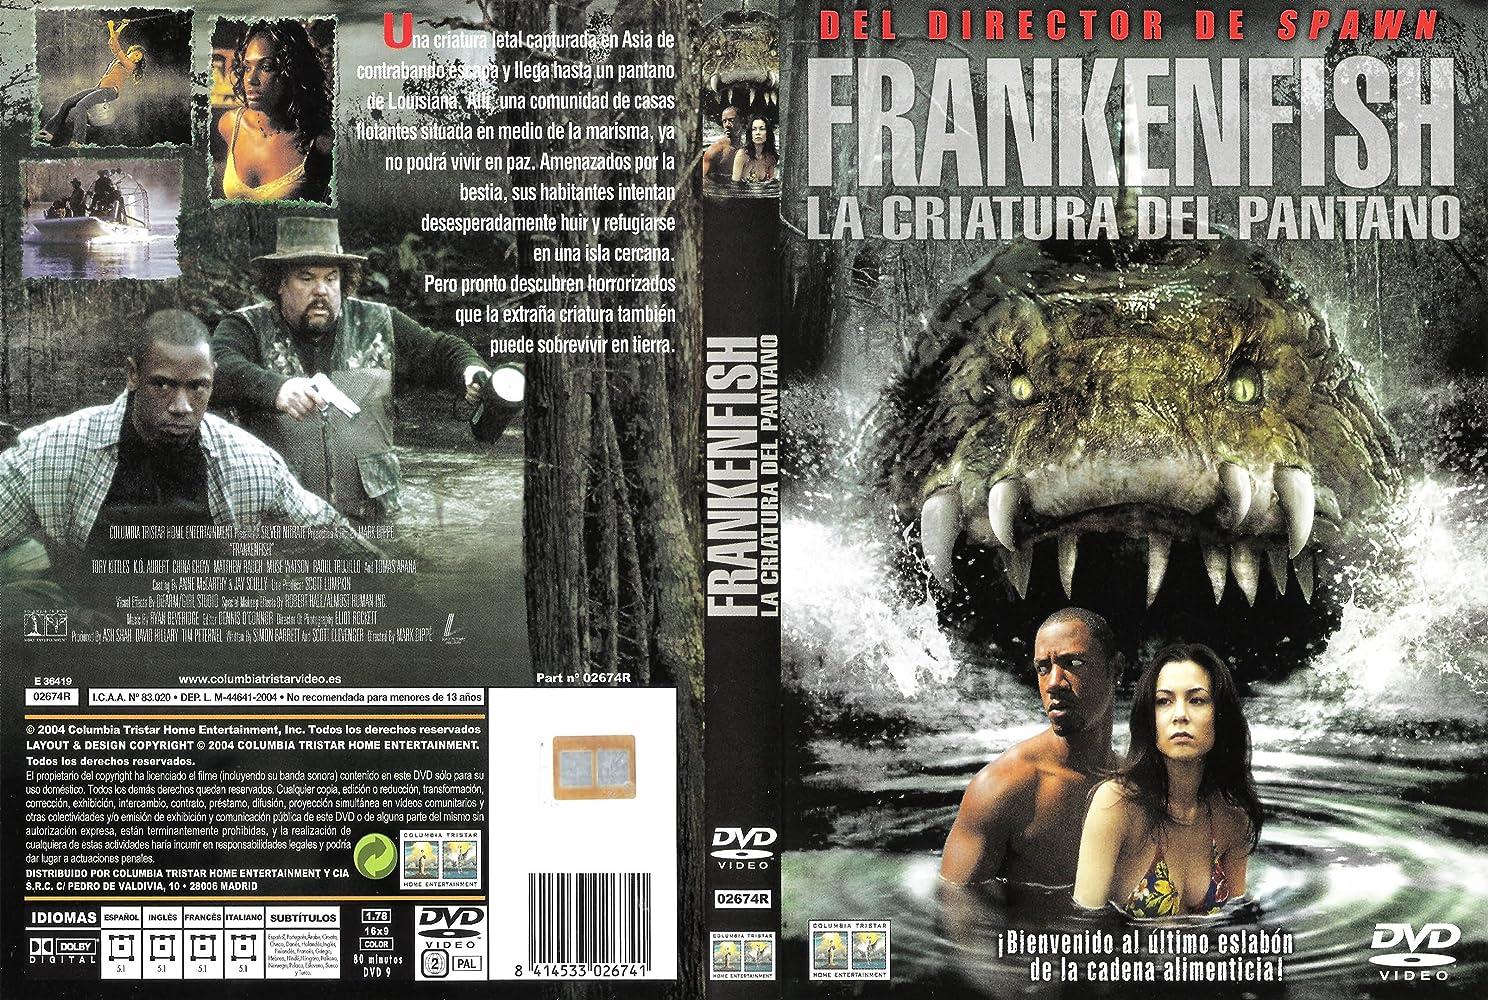 Frankenfish – Peştele ucigaş, Online Subtitrat